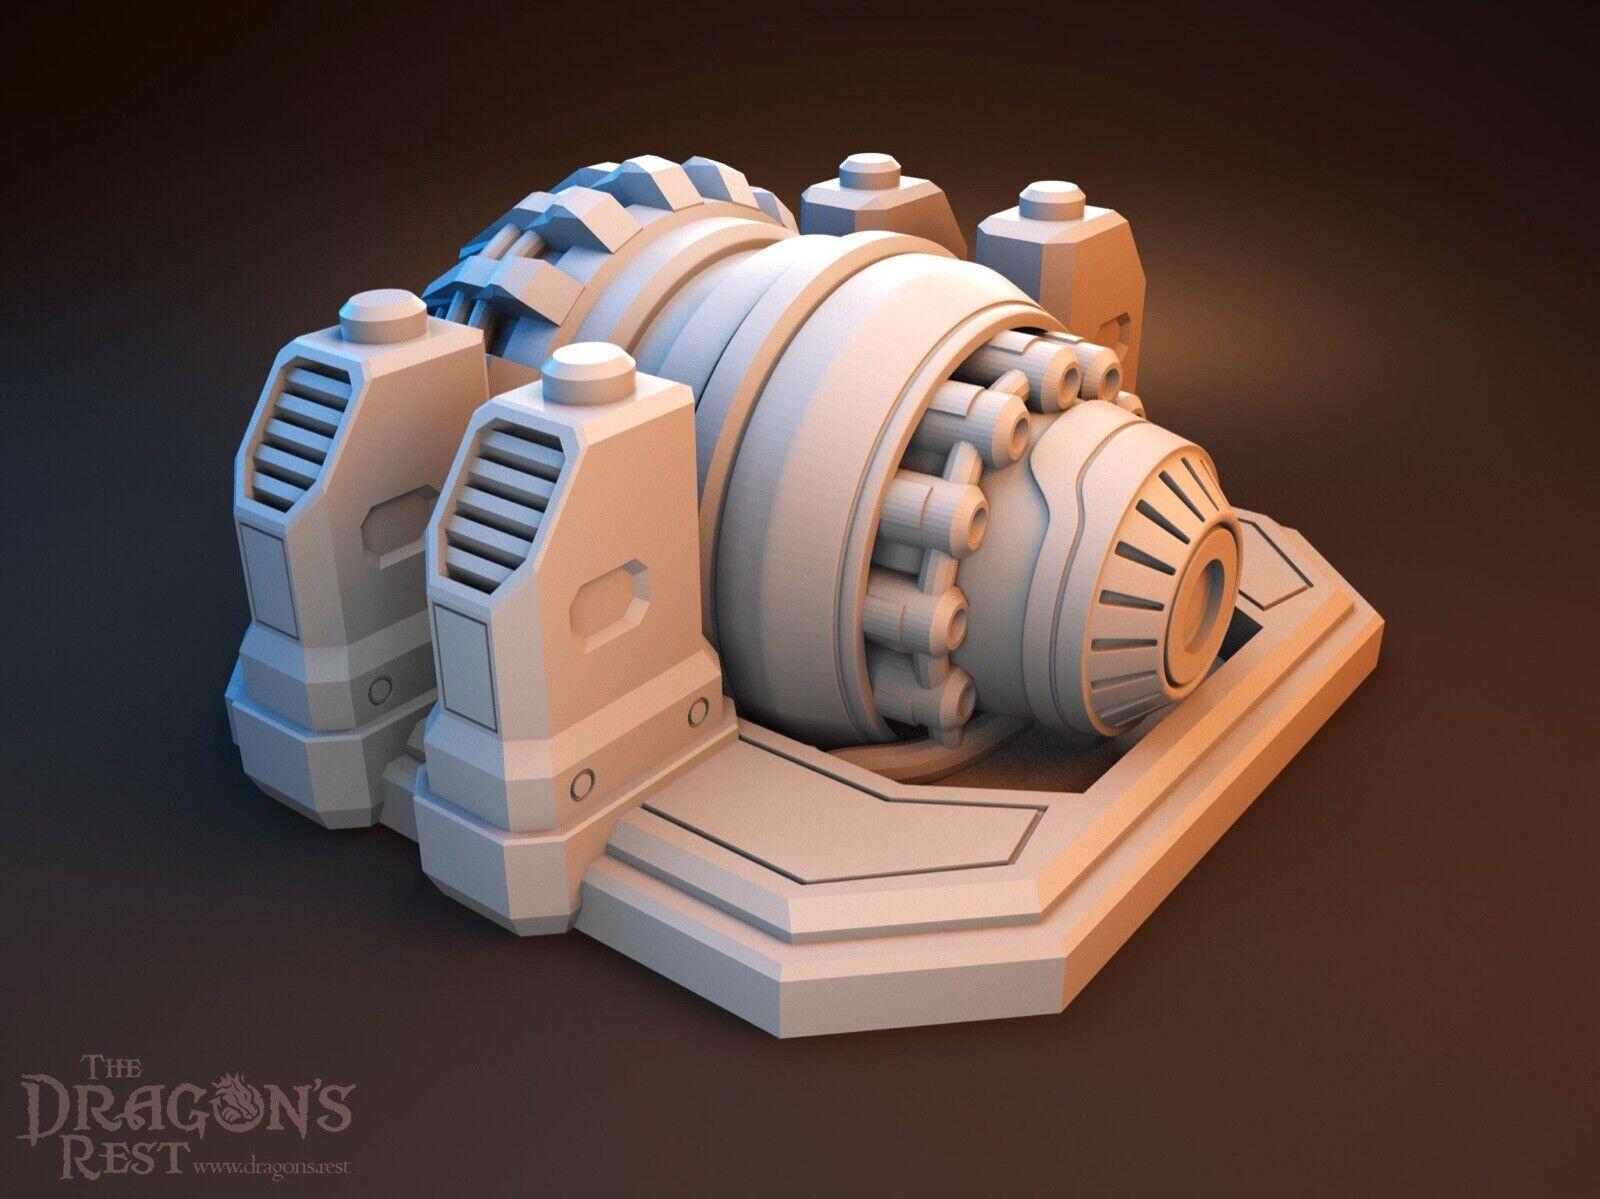 Sci Fi Comms Tower 28mm Wargame Terrain Infinity Warhammer 40K Star Wars Legion